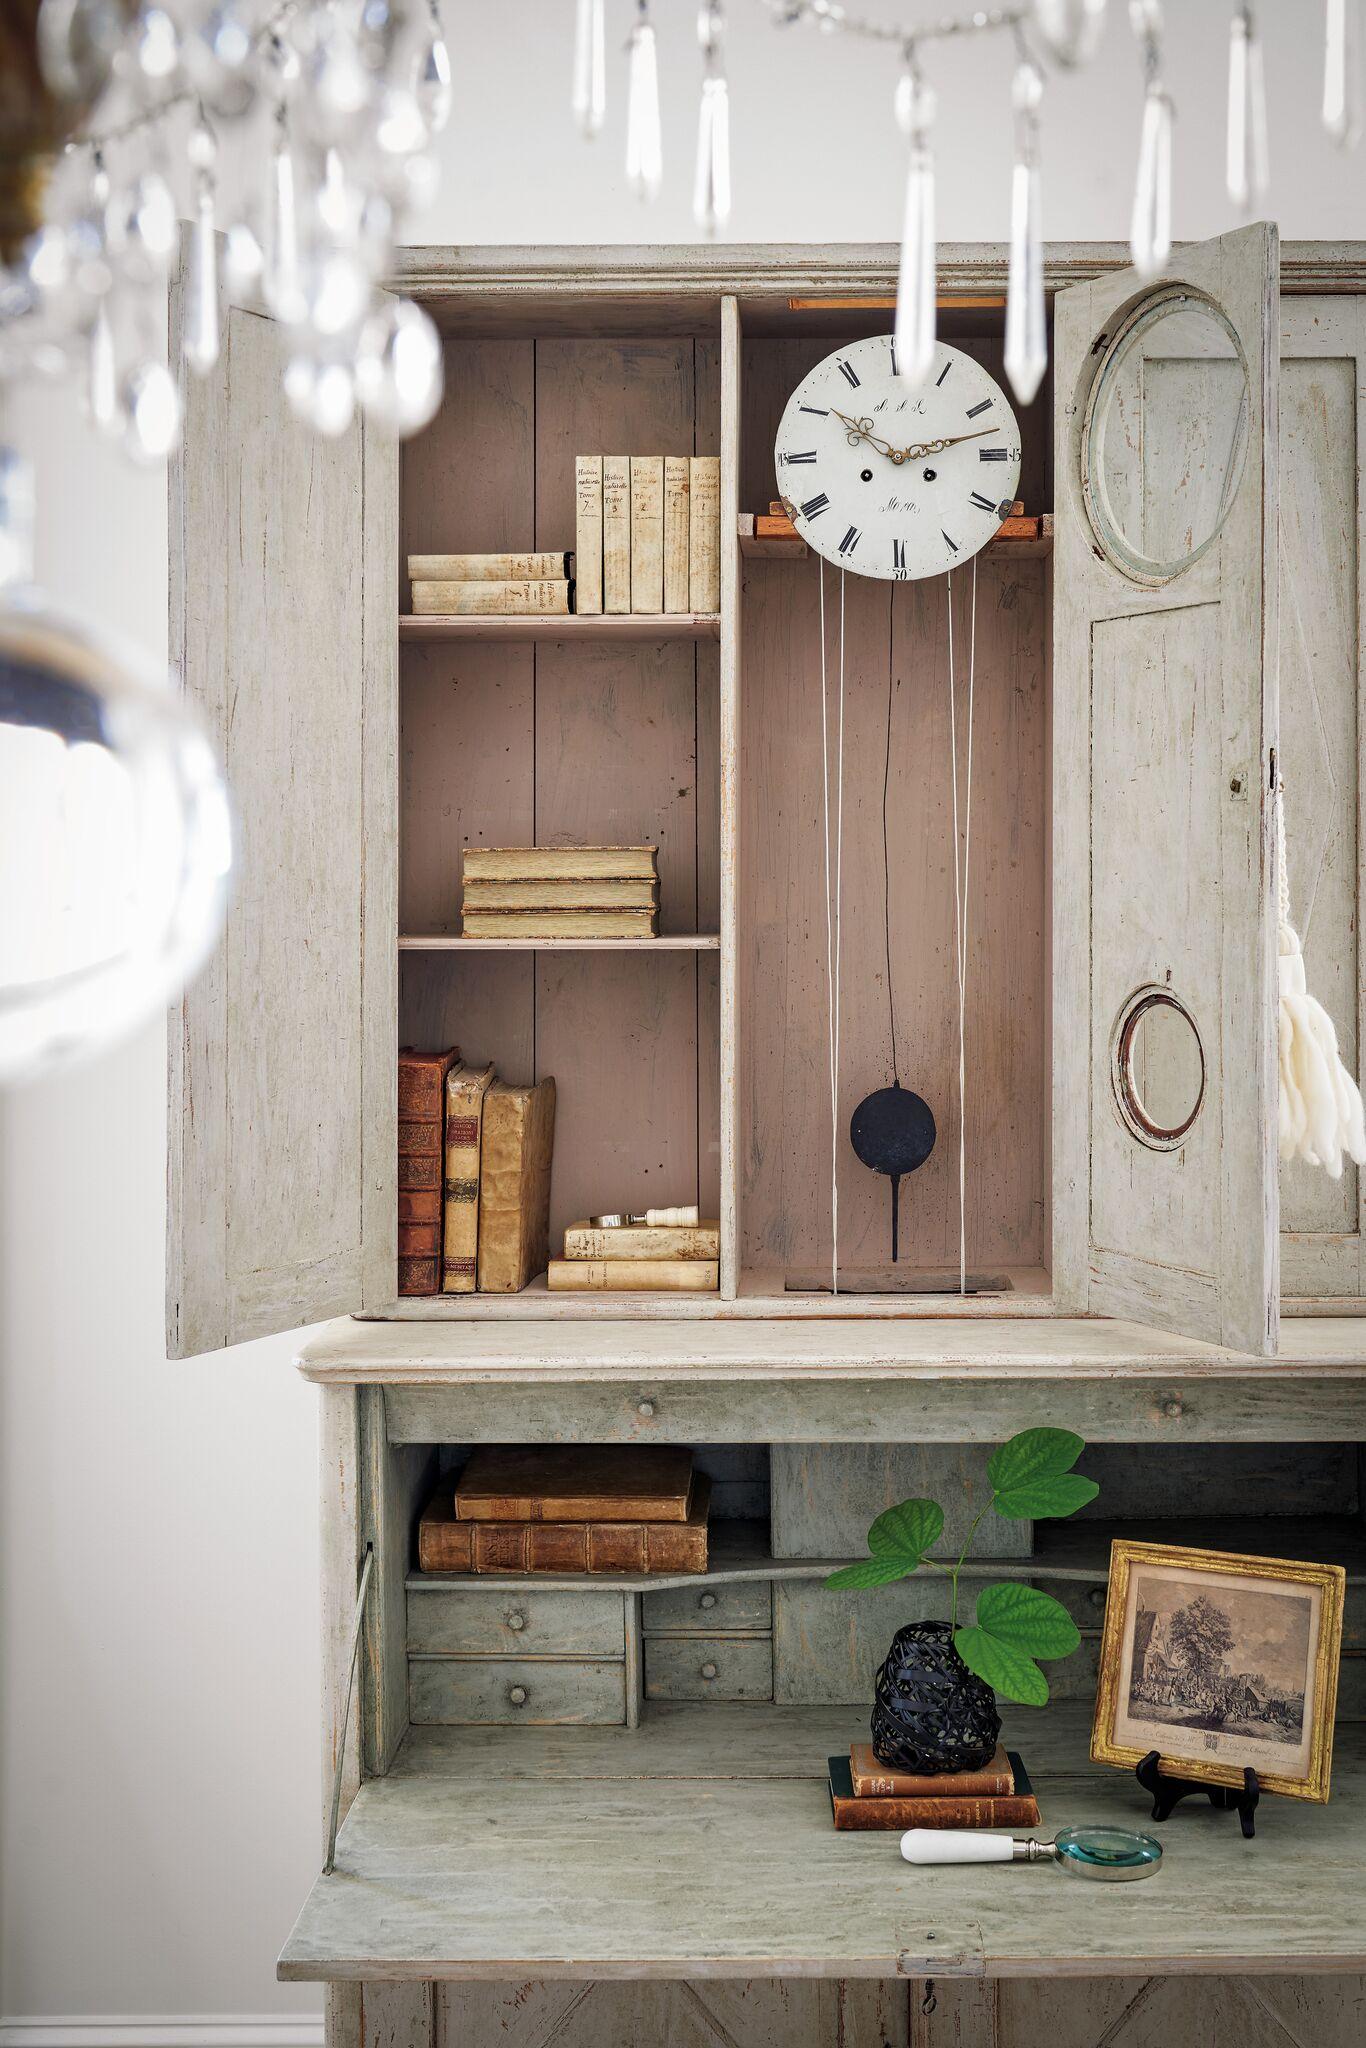 Gustavian clock secretary has cabinets beneath the desktop doubling as storage. #swedishantiques #tarashaw #interiordesign #secretary #antiques #oldworldstyle